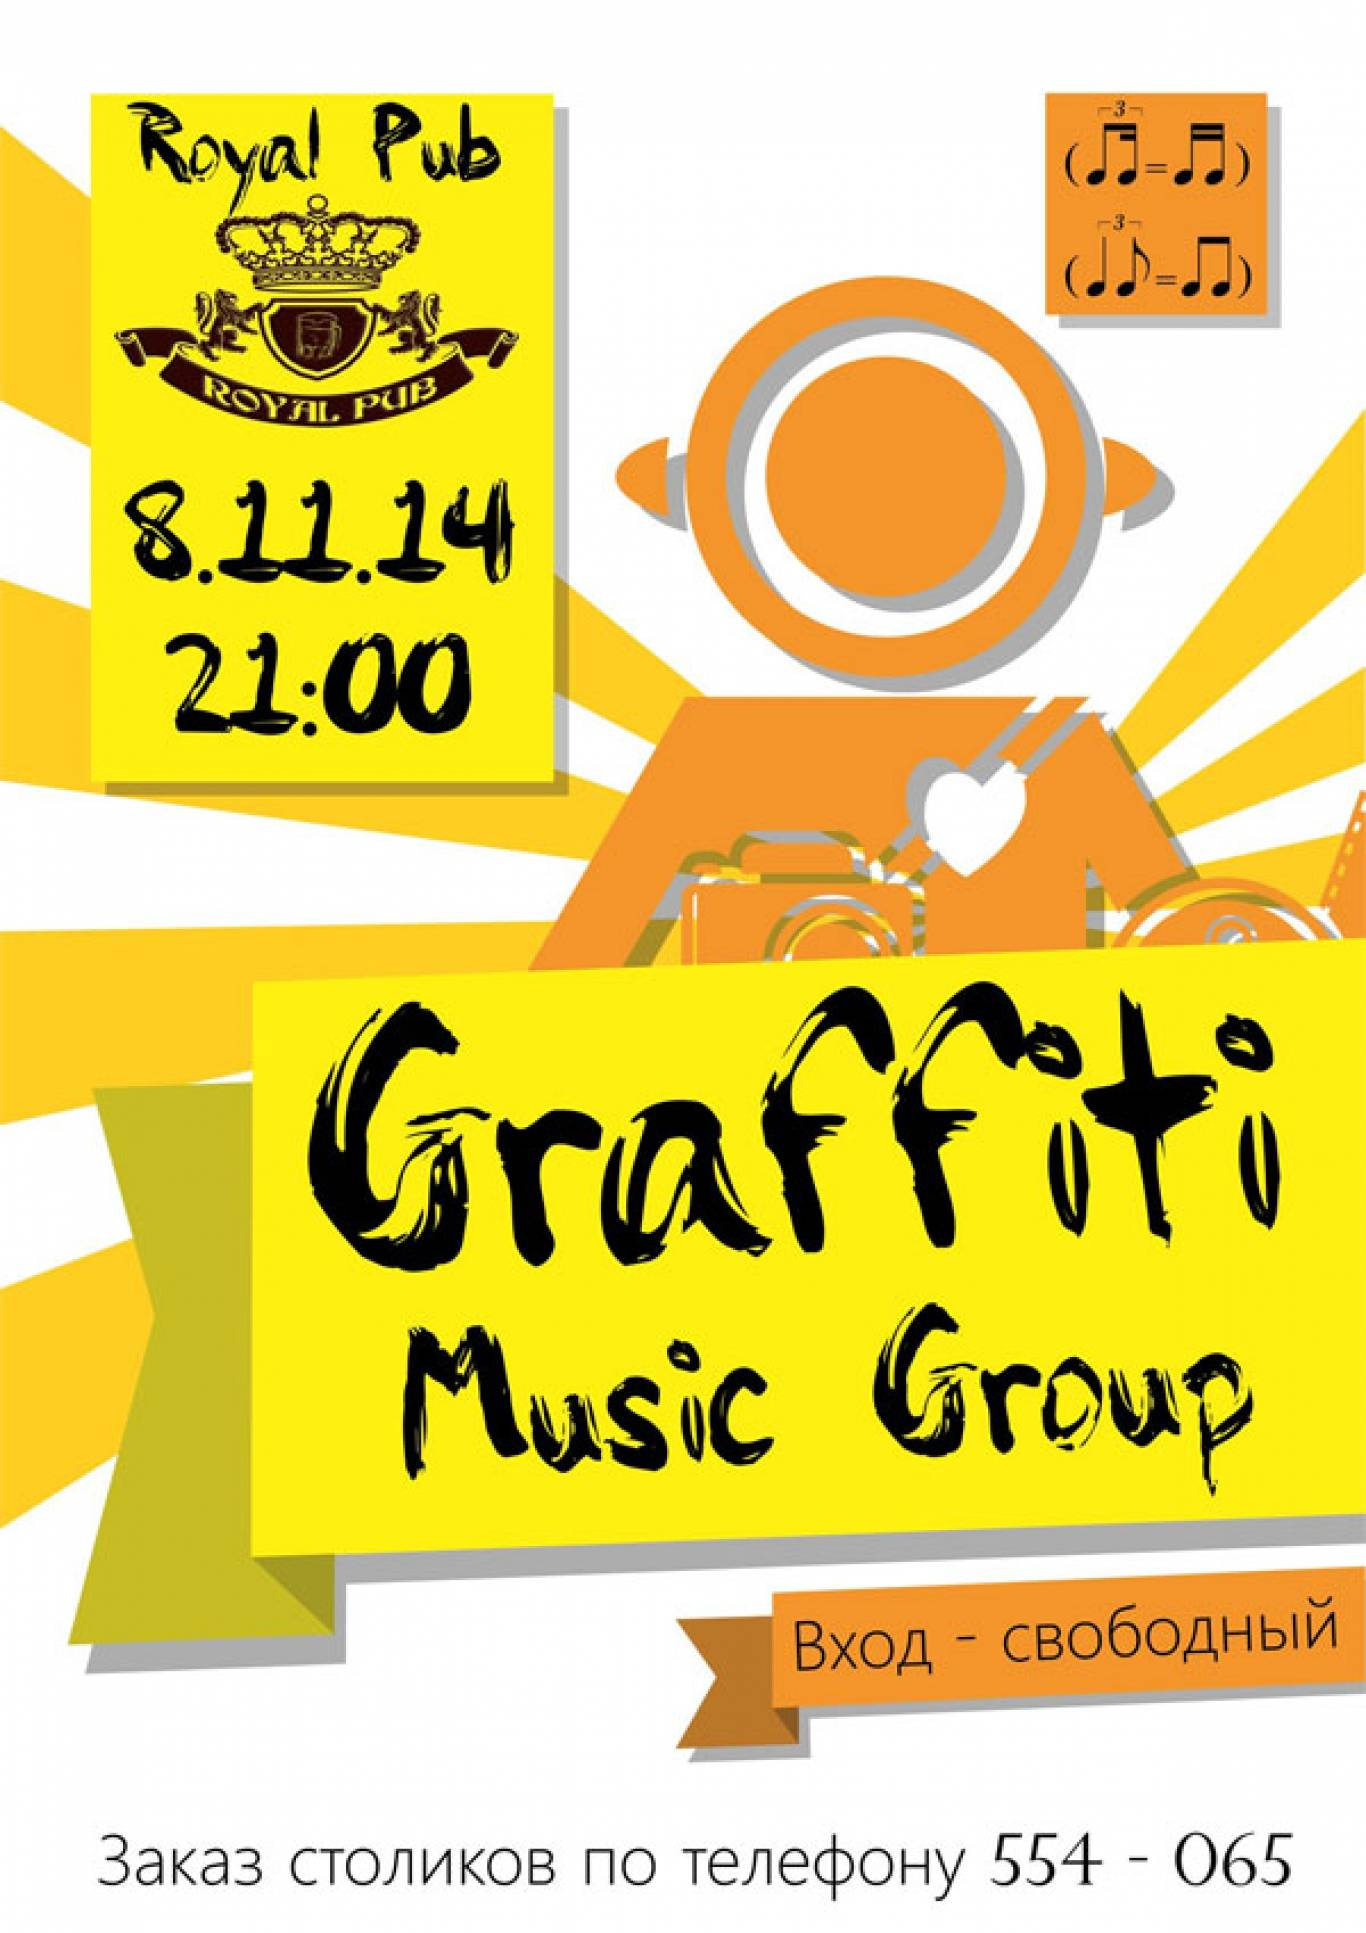 Група «Graffiti» в Royal pab